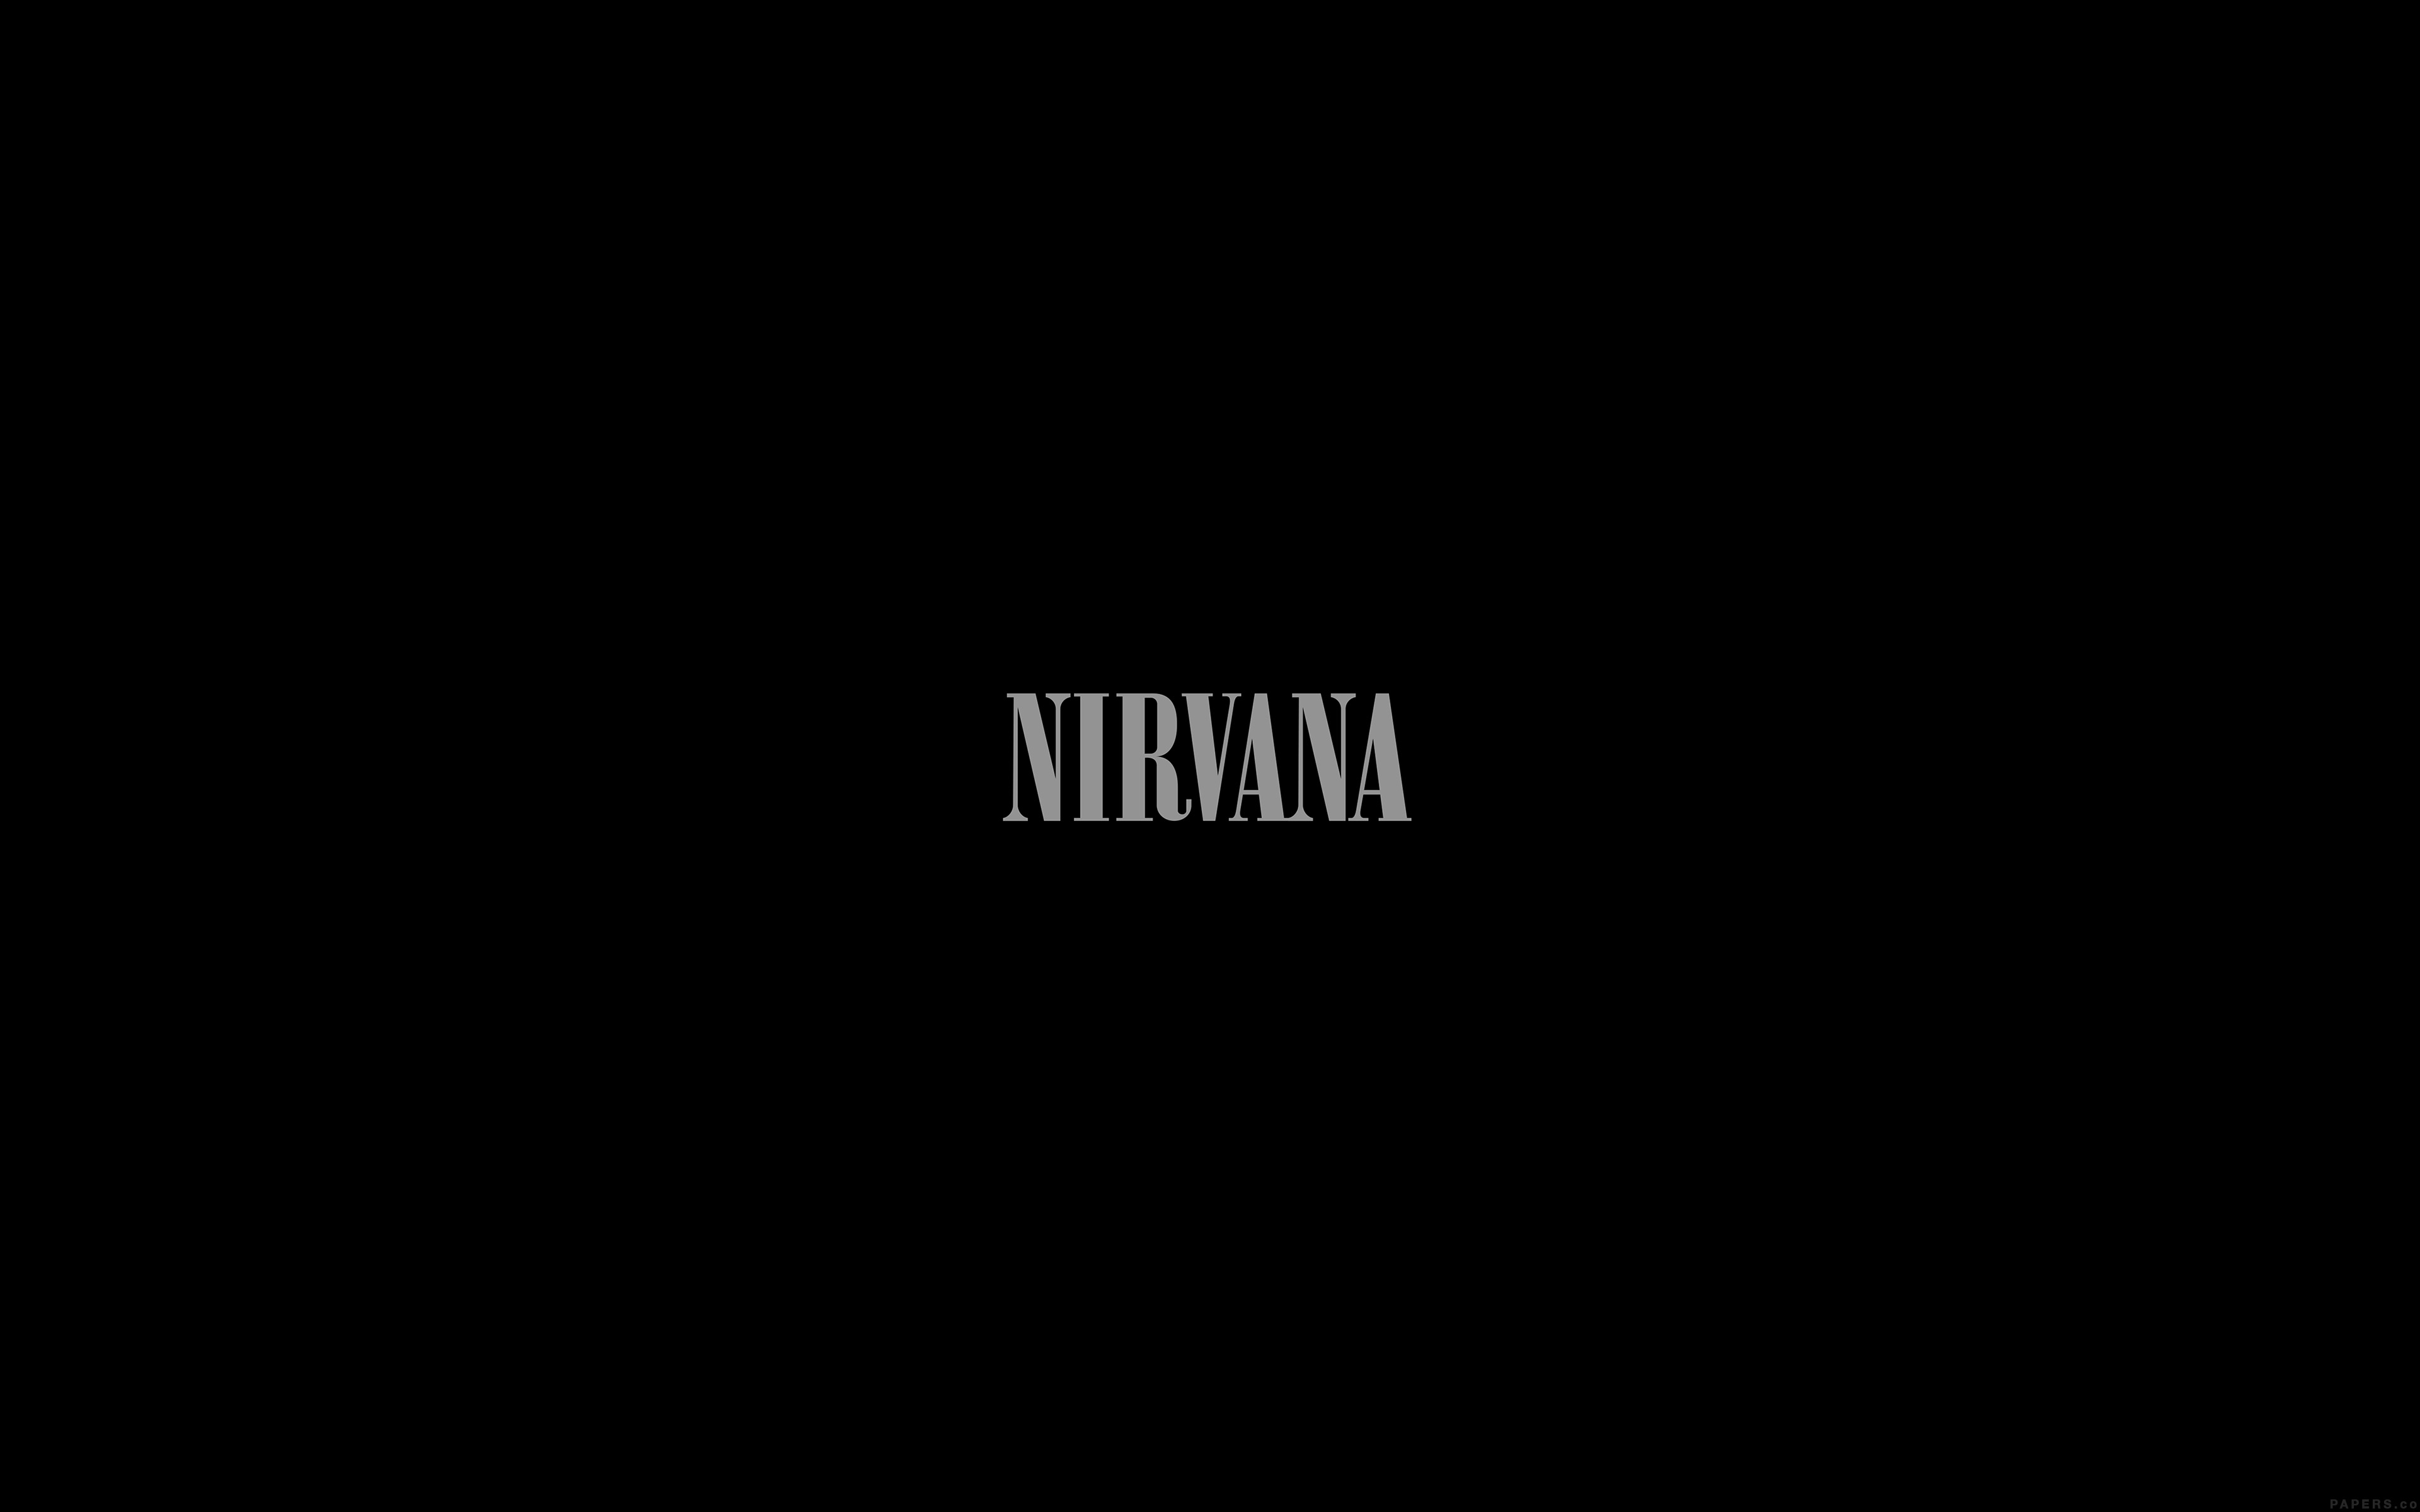 Cute Fall Computer Wallpaper Ak78 Nirvana Dark Logo Simple Minimal Music Wallpaper